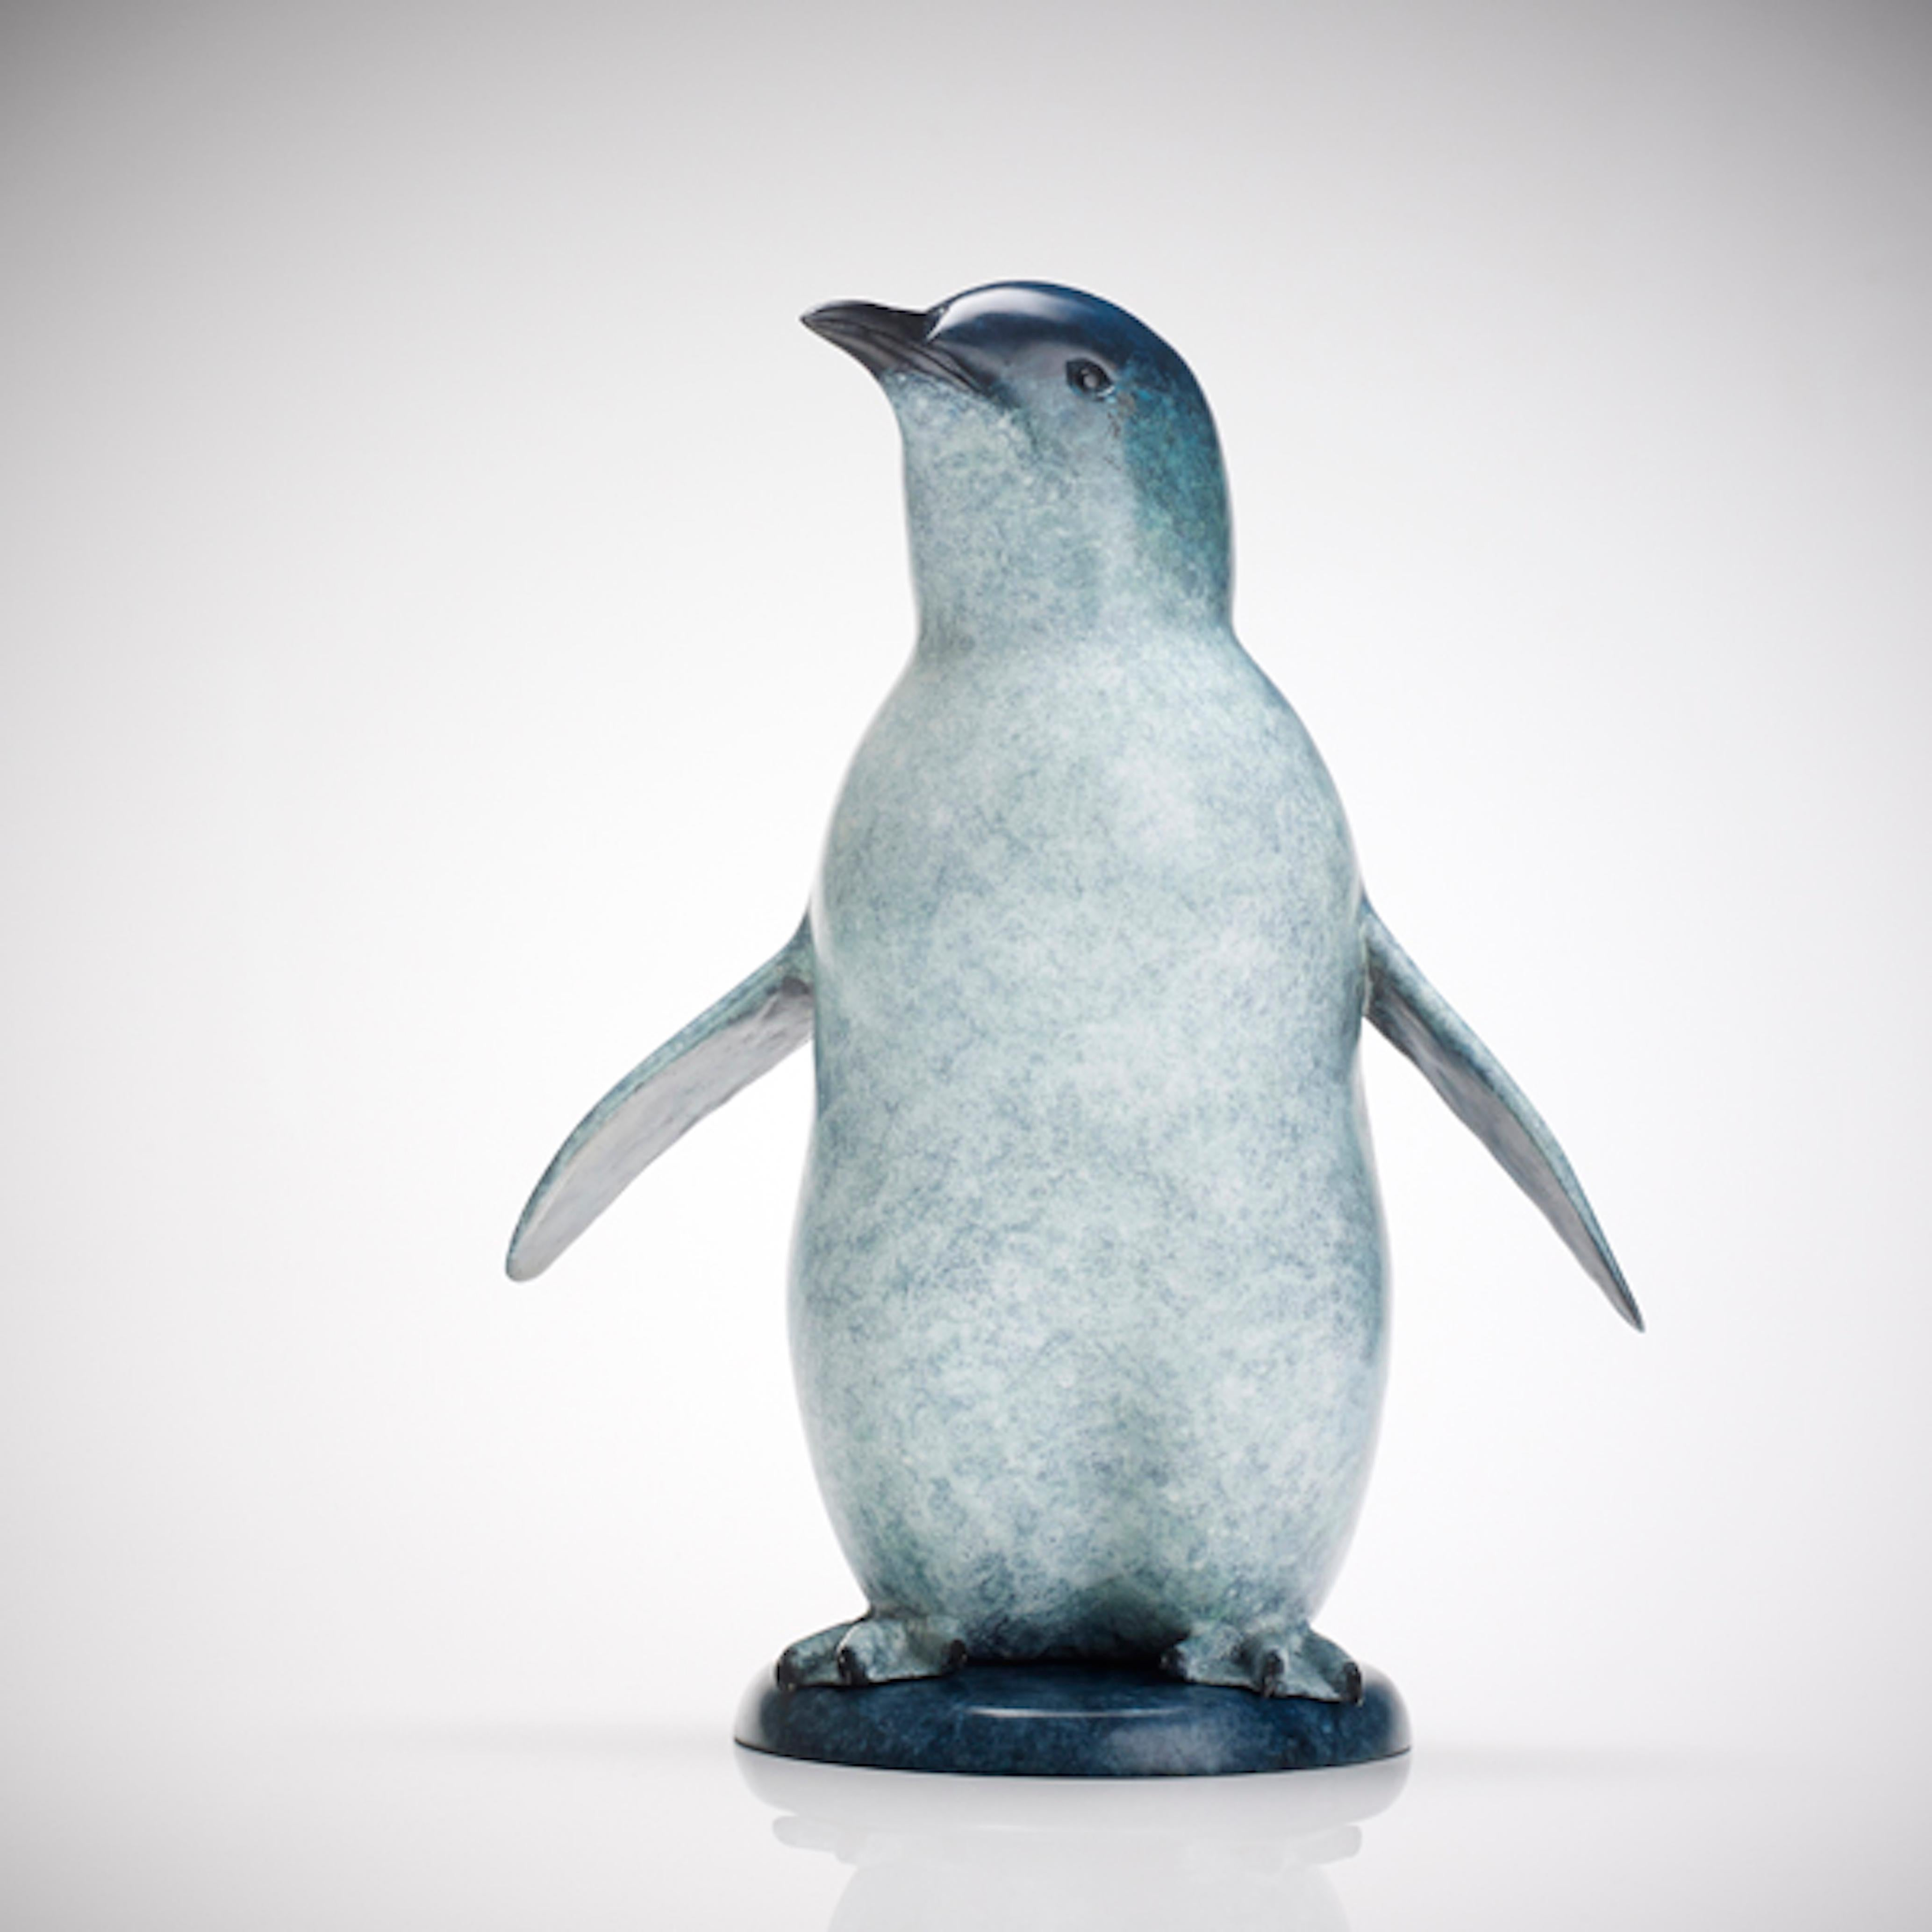 Contemporary Bronze Wildlife Penguin Sculpture 'Little Blue' by Richard Smith